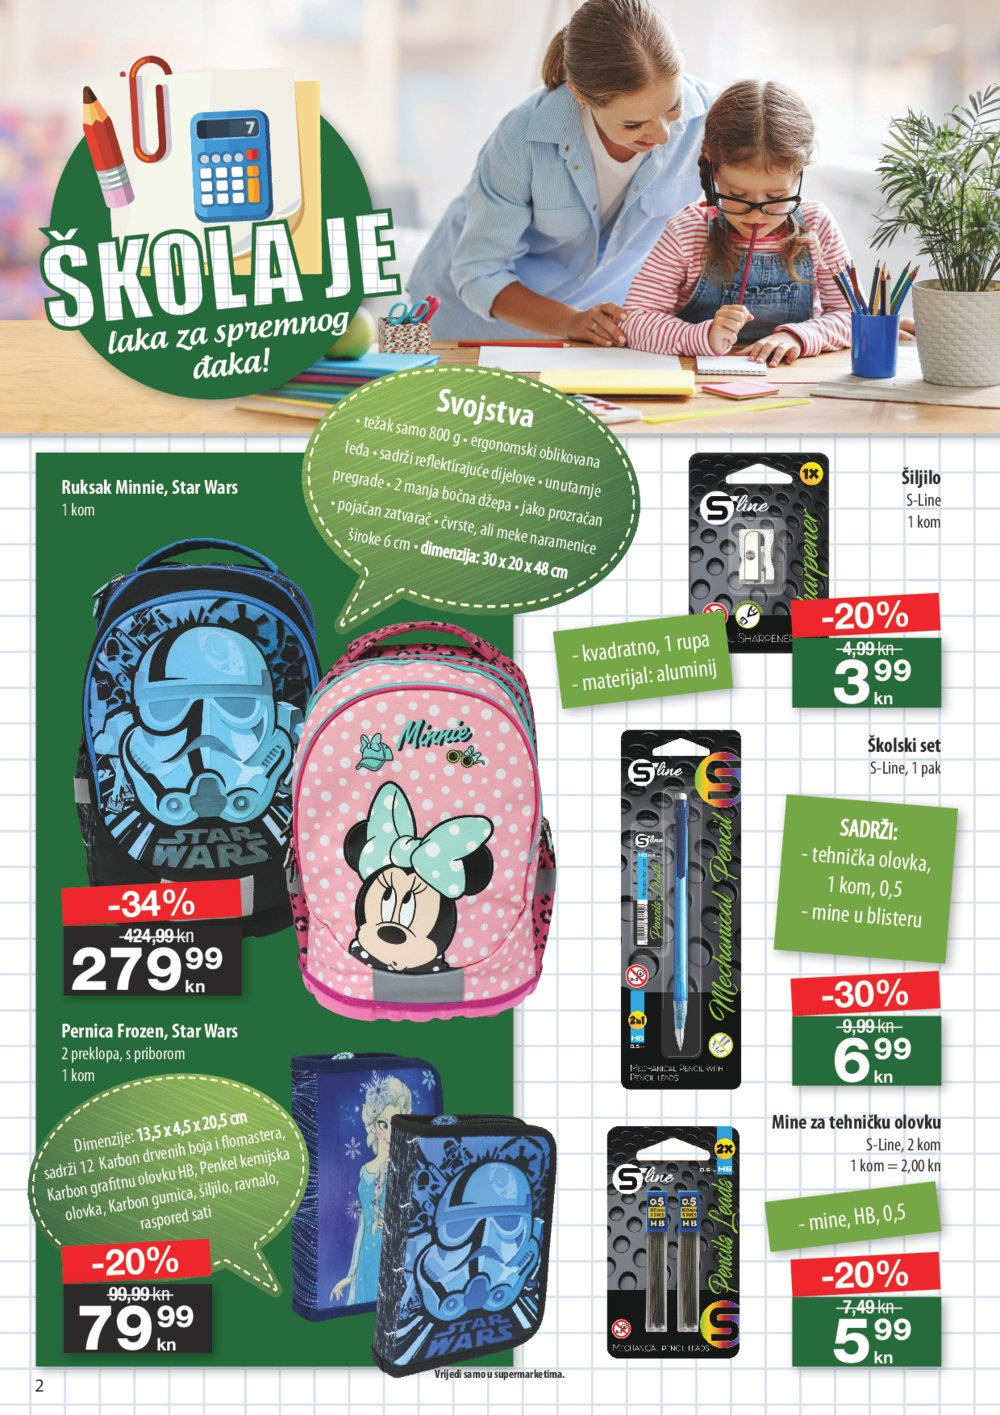 NTL katalog Akcija 15.08.2019.-21.08.2019. Soblinec, Duga Resa, Lučko, Krapina F.Galovića, Krapina Magistratska, Zagreb Bužanova, Zagreb Vlaška, Varaždin K. Filića